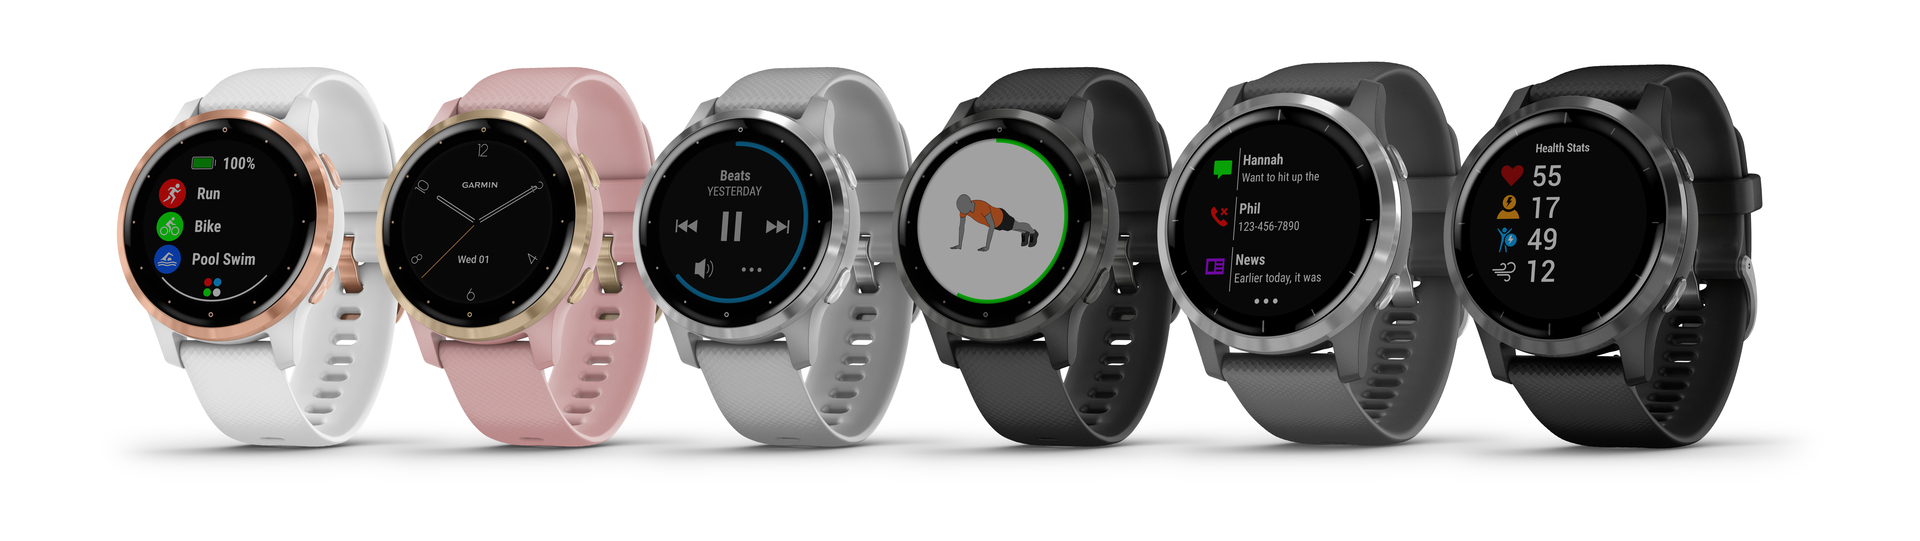 غارمين vivoactive 4 smartwatches